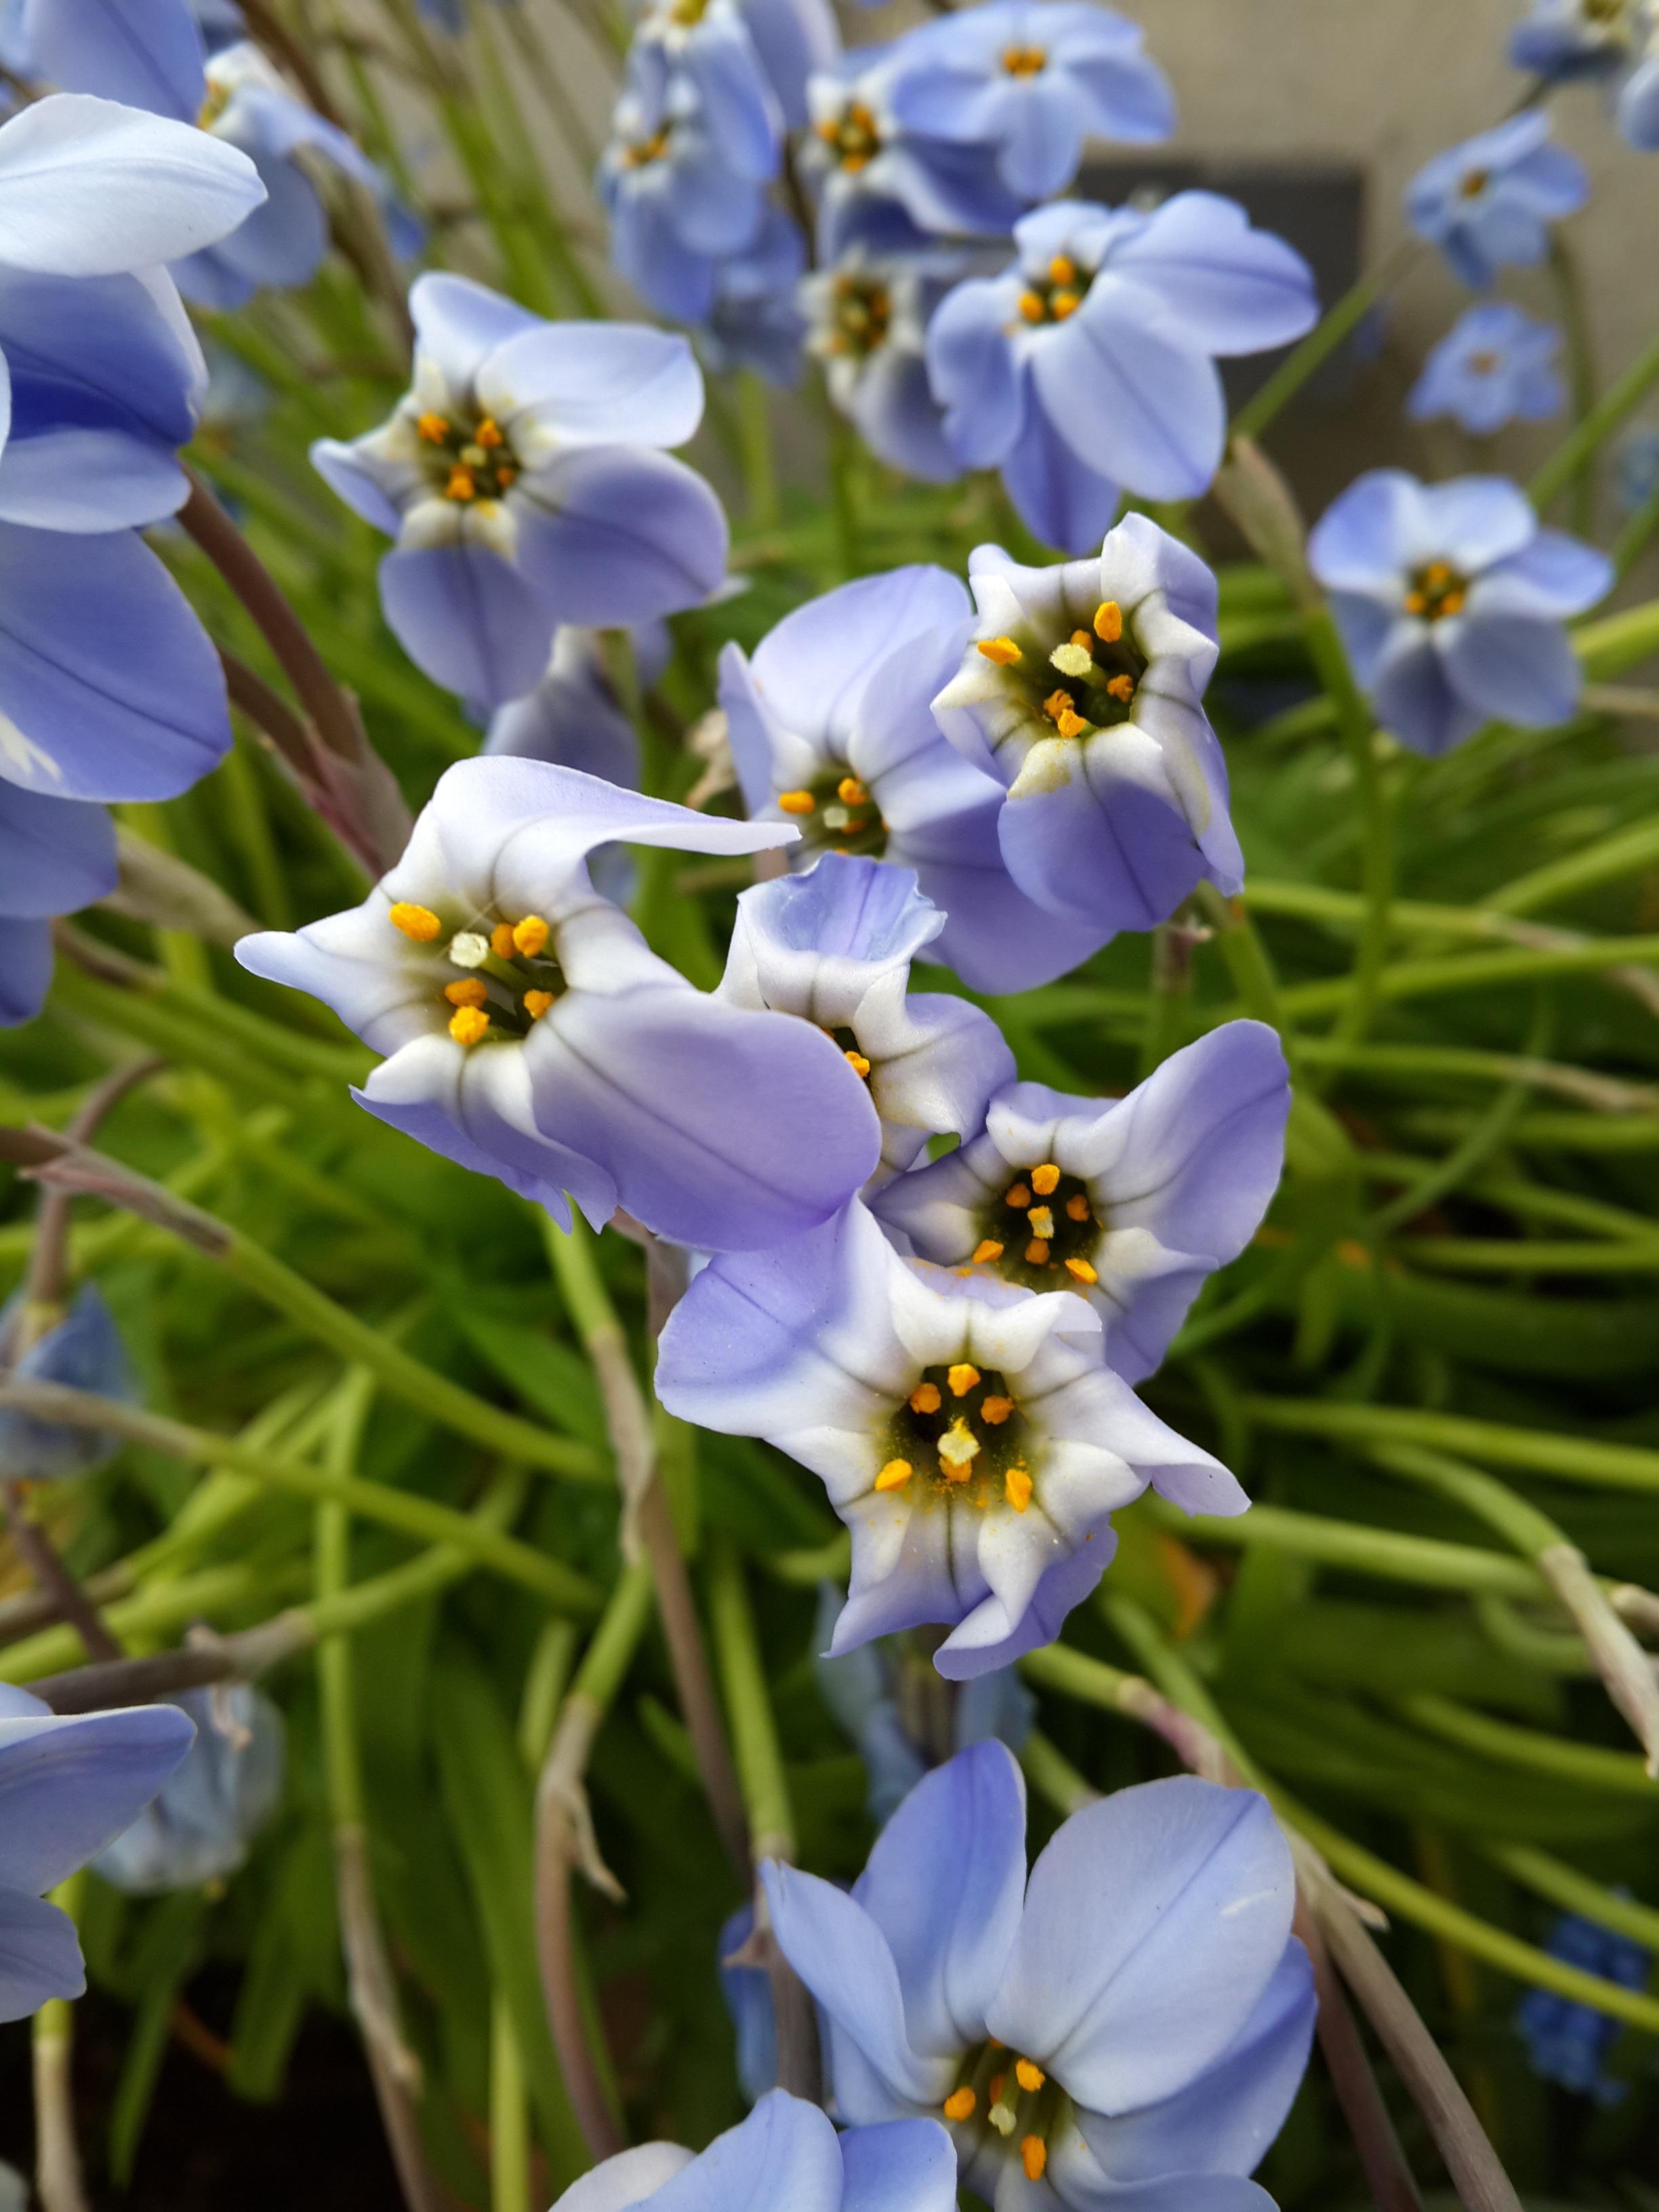 Fotos Gratis Naturaleza Botanica Flora Flor Silvestre Flores Azalea Planta Floreciendo Petalos Azules Planta De Tierra Jardines De Kew 2448x3264 864598 Imagenes Gratis Pxhere